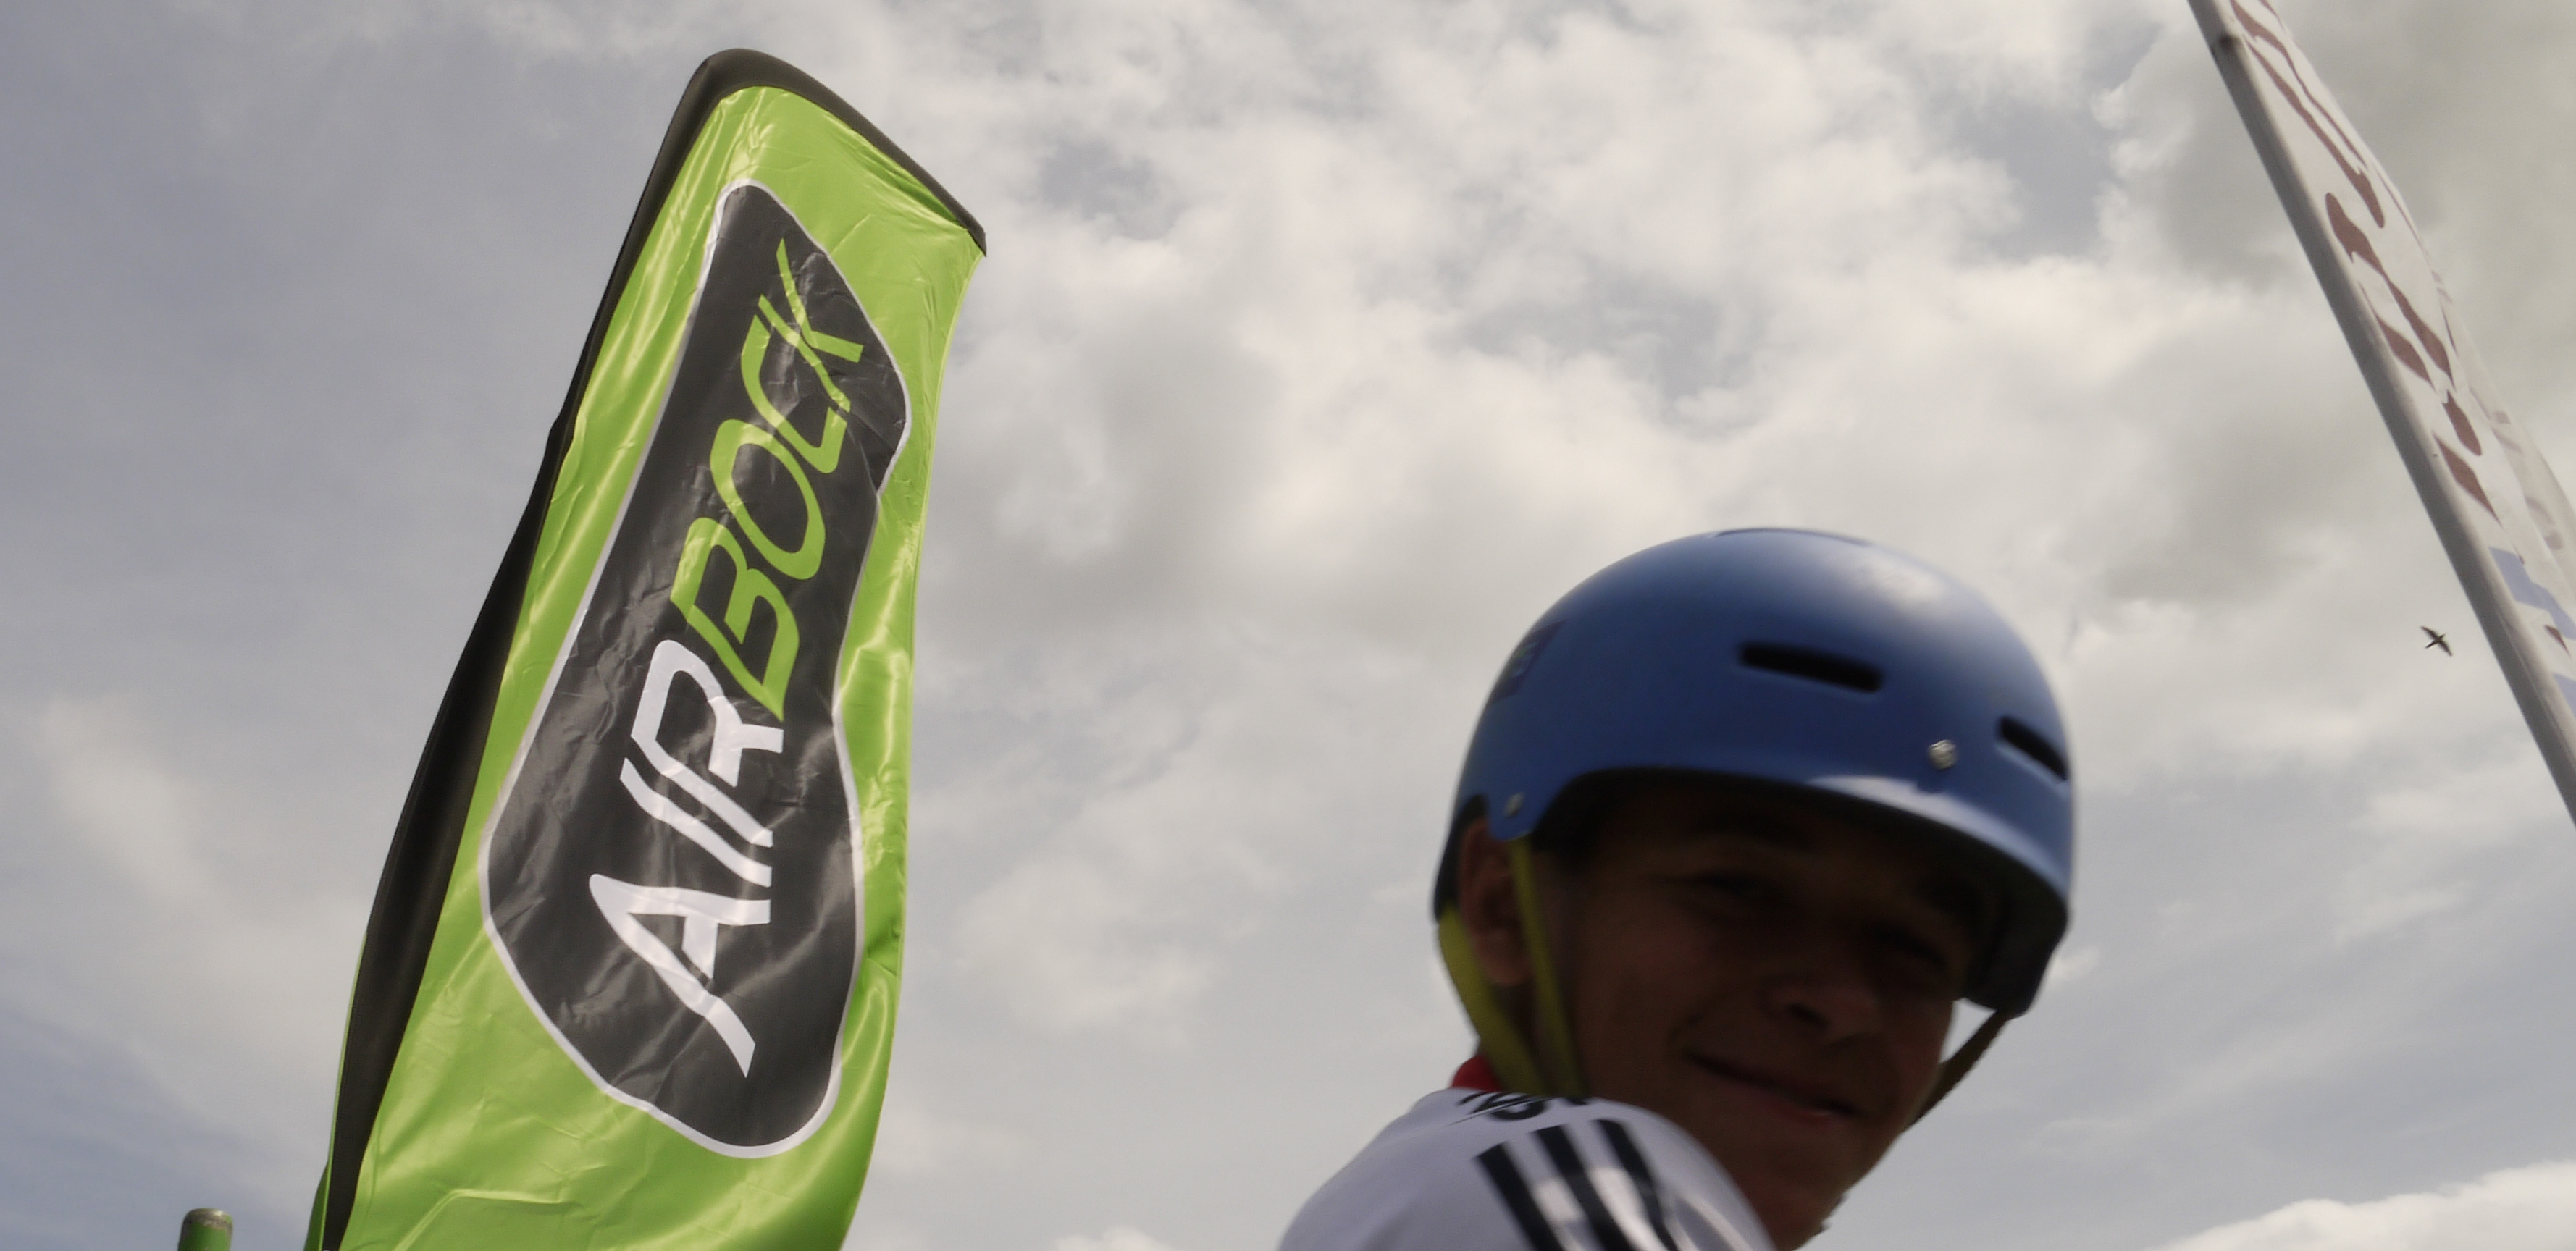 BMX-WK-2015-UCI Zolder